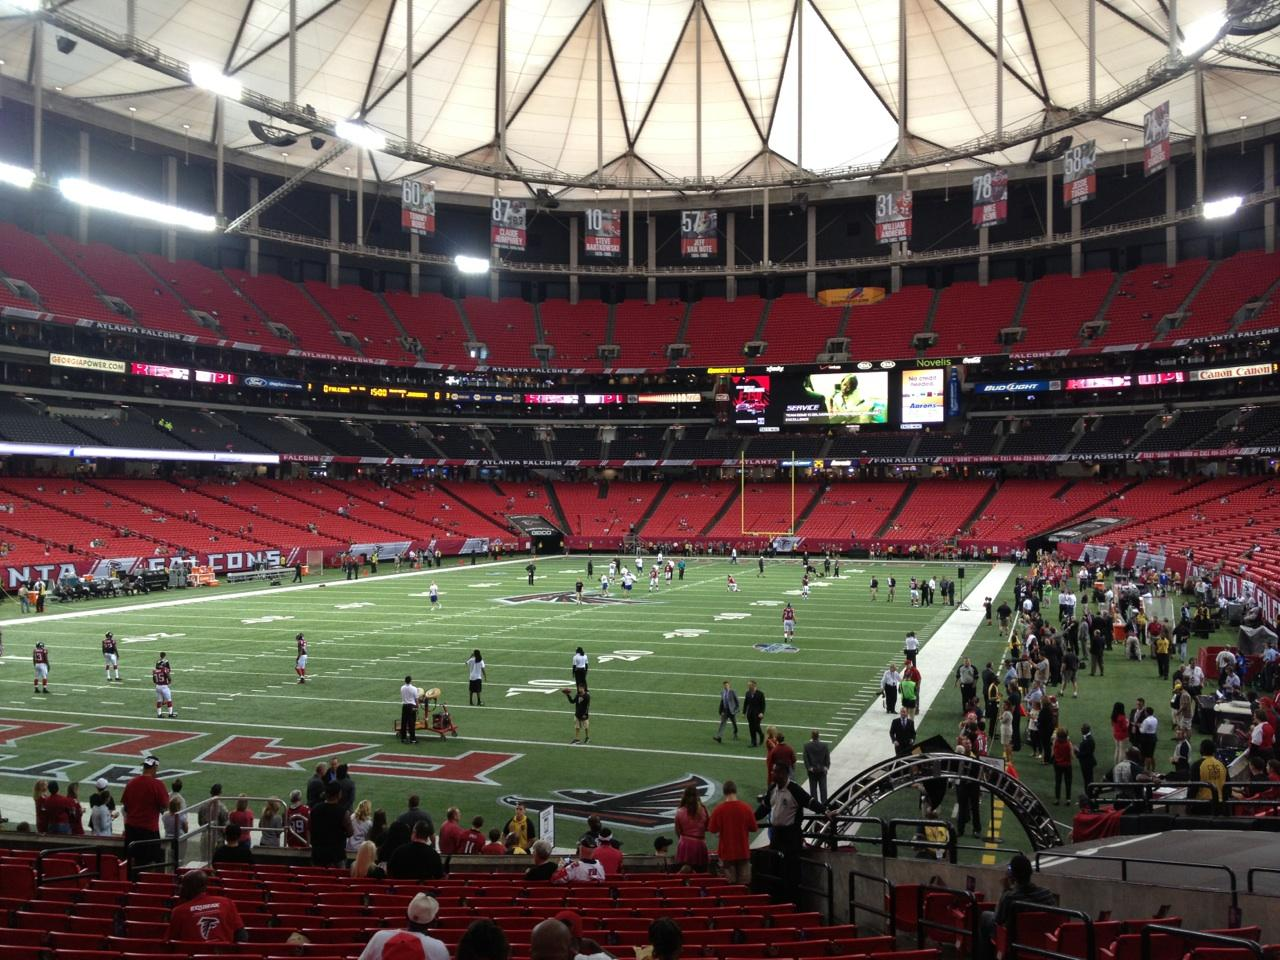 Georgia Dome Section 124 Row 6 Seat 6